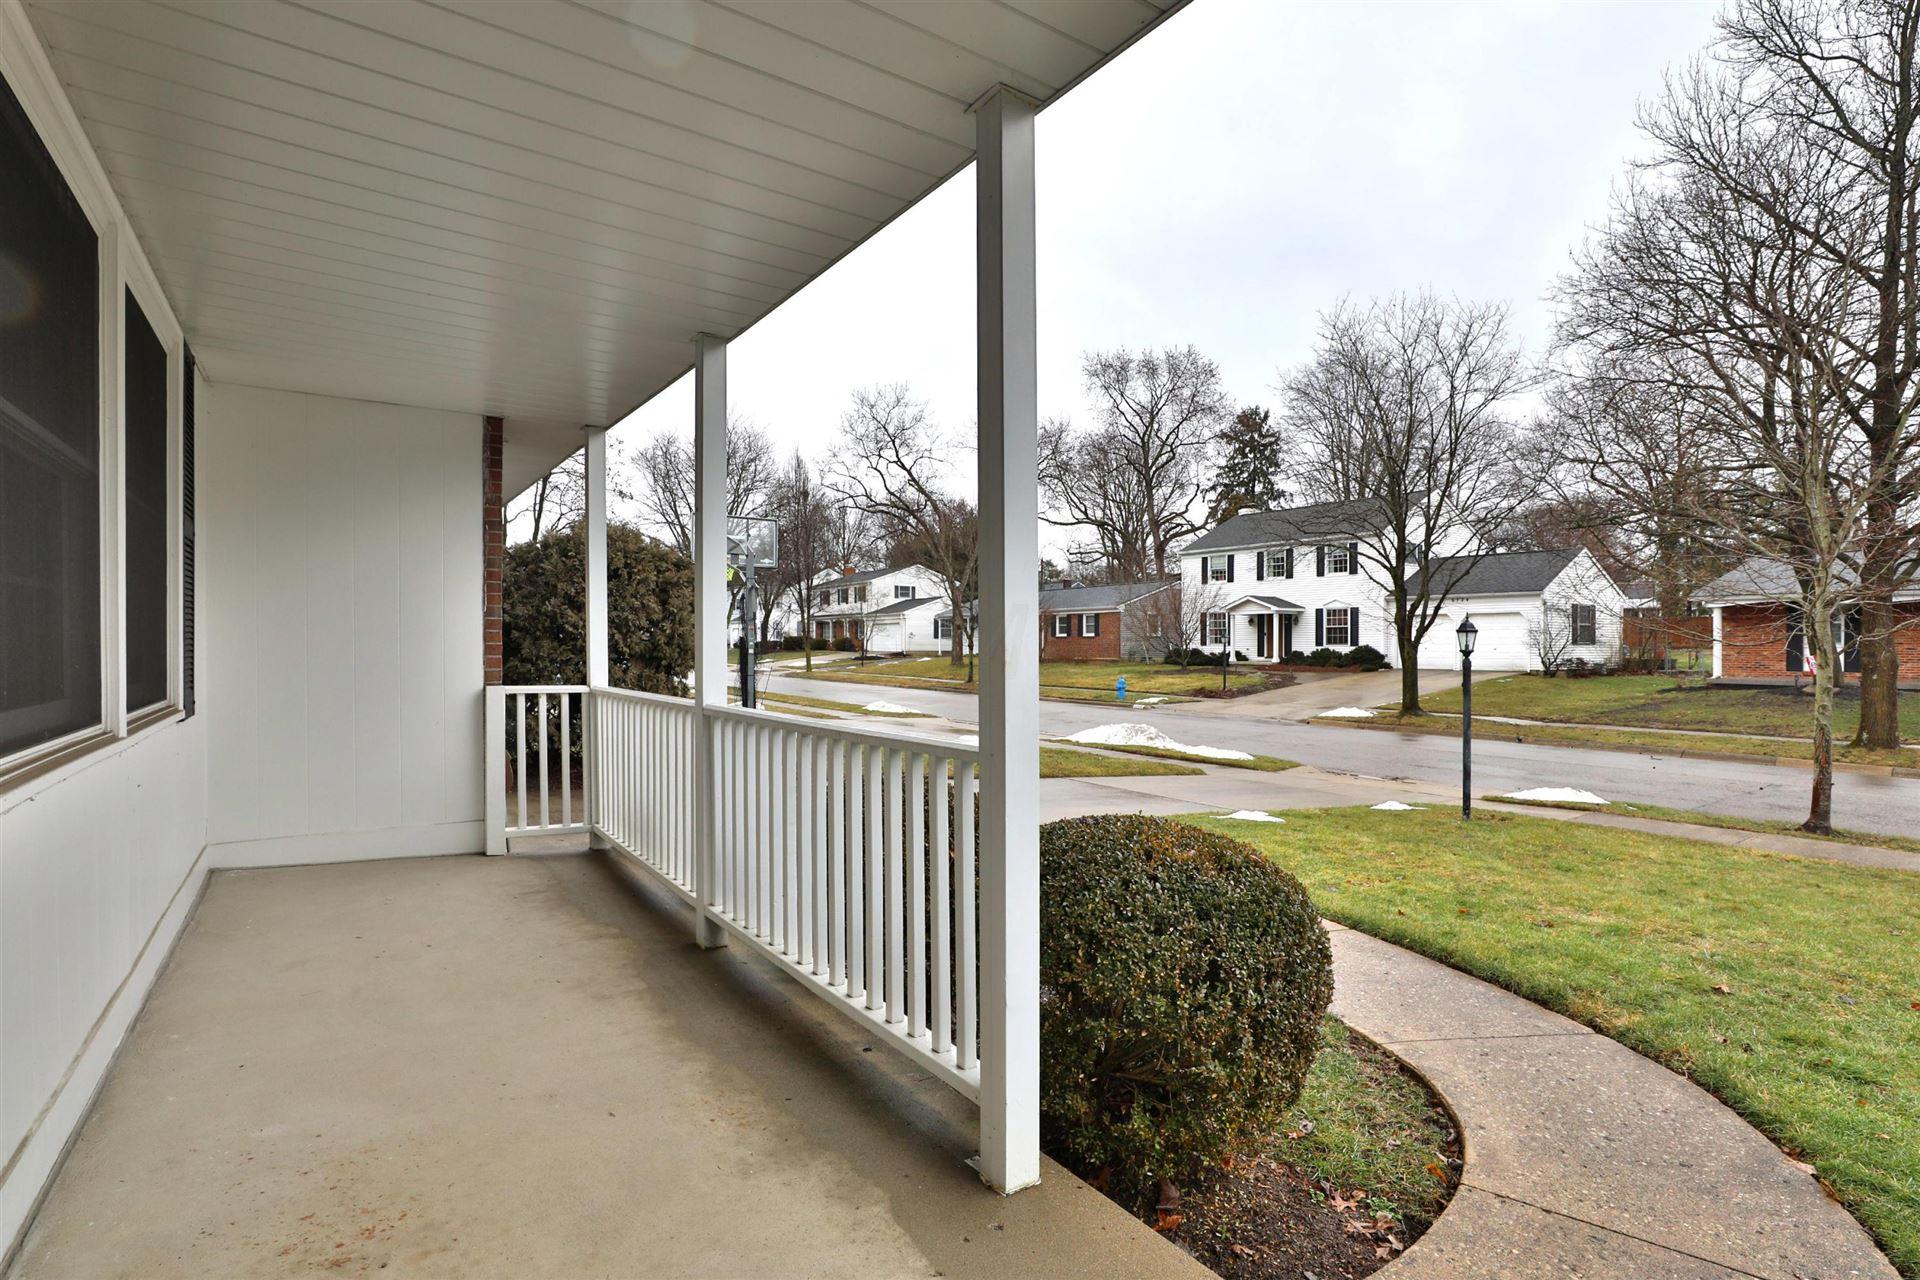 Photo of 6715 Thorne Street, Worthington, OH 43085 (MLS # 221005622)